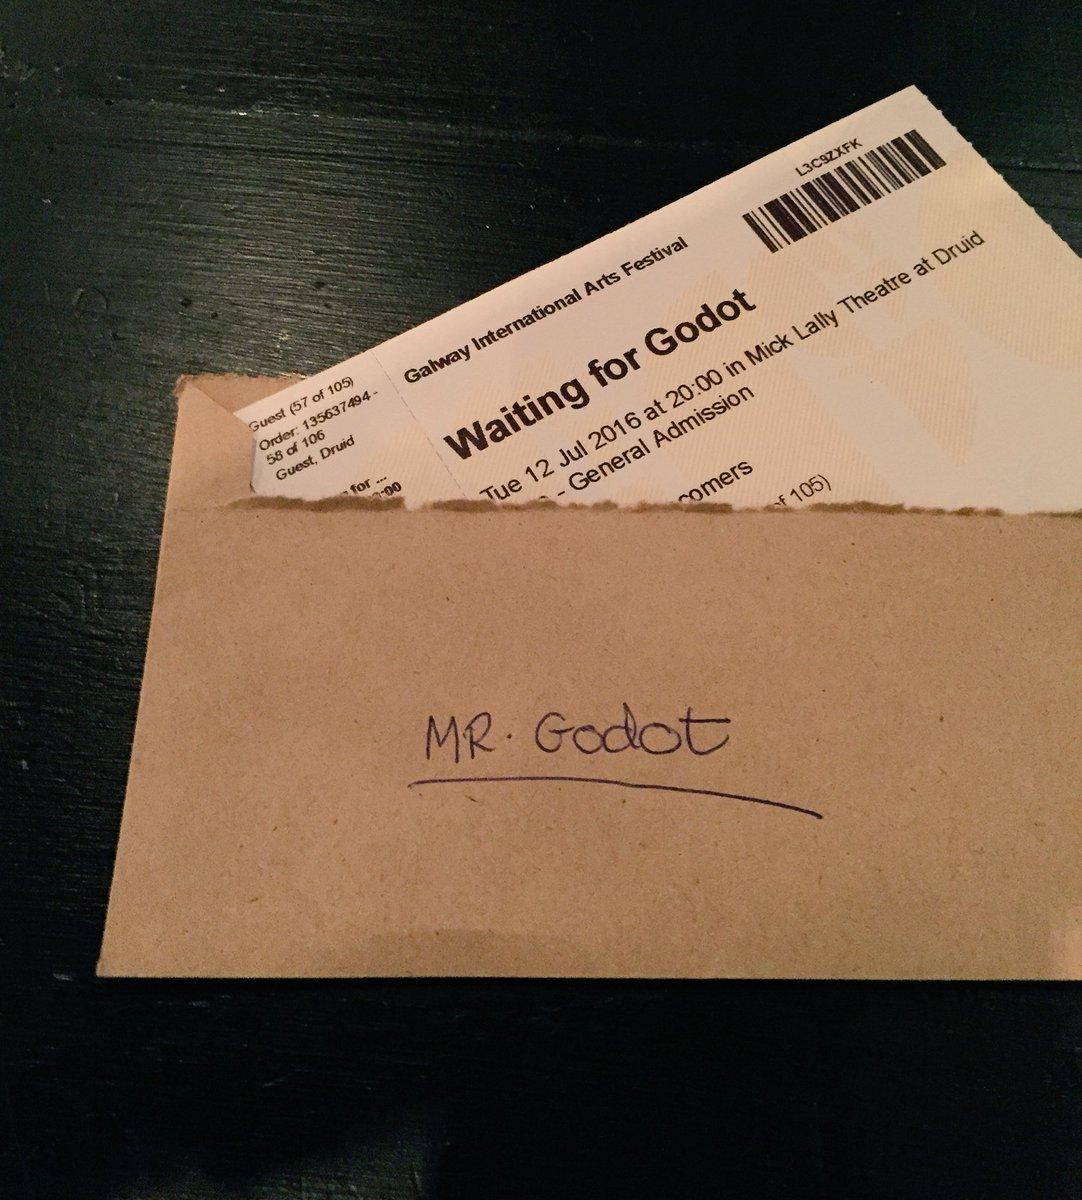 Mr. Godot was a no show at the box office again tonight. #rude #waitingforgodot https://t.co/RA5xSWUv6P